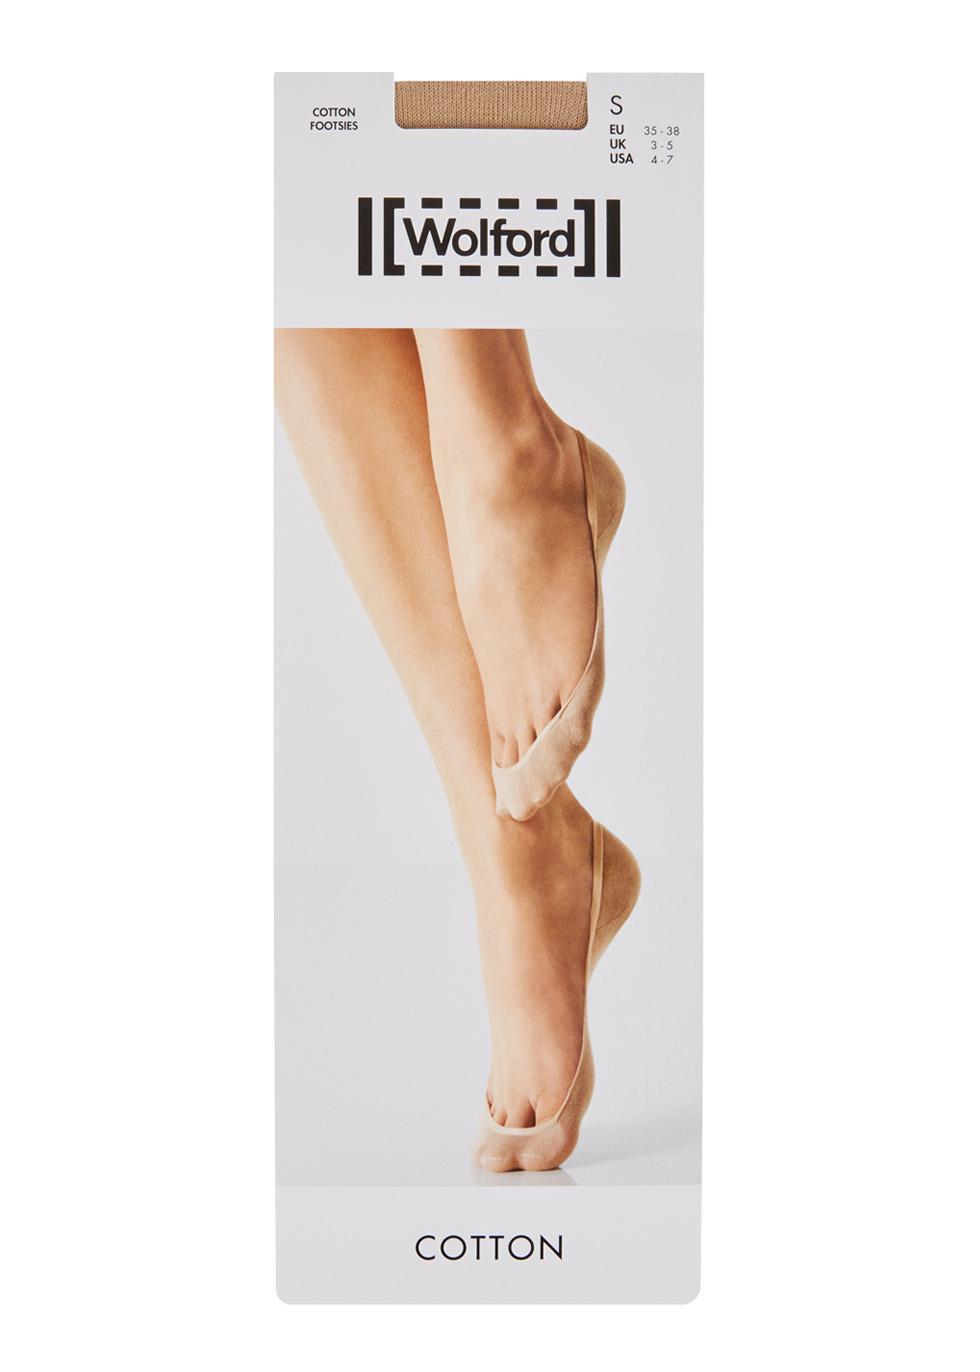 Black // Cotton SMALL U.K 3-5 Wolford Cotton Footsies // Socks